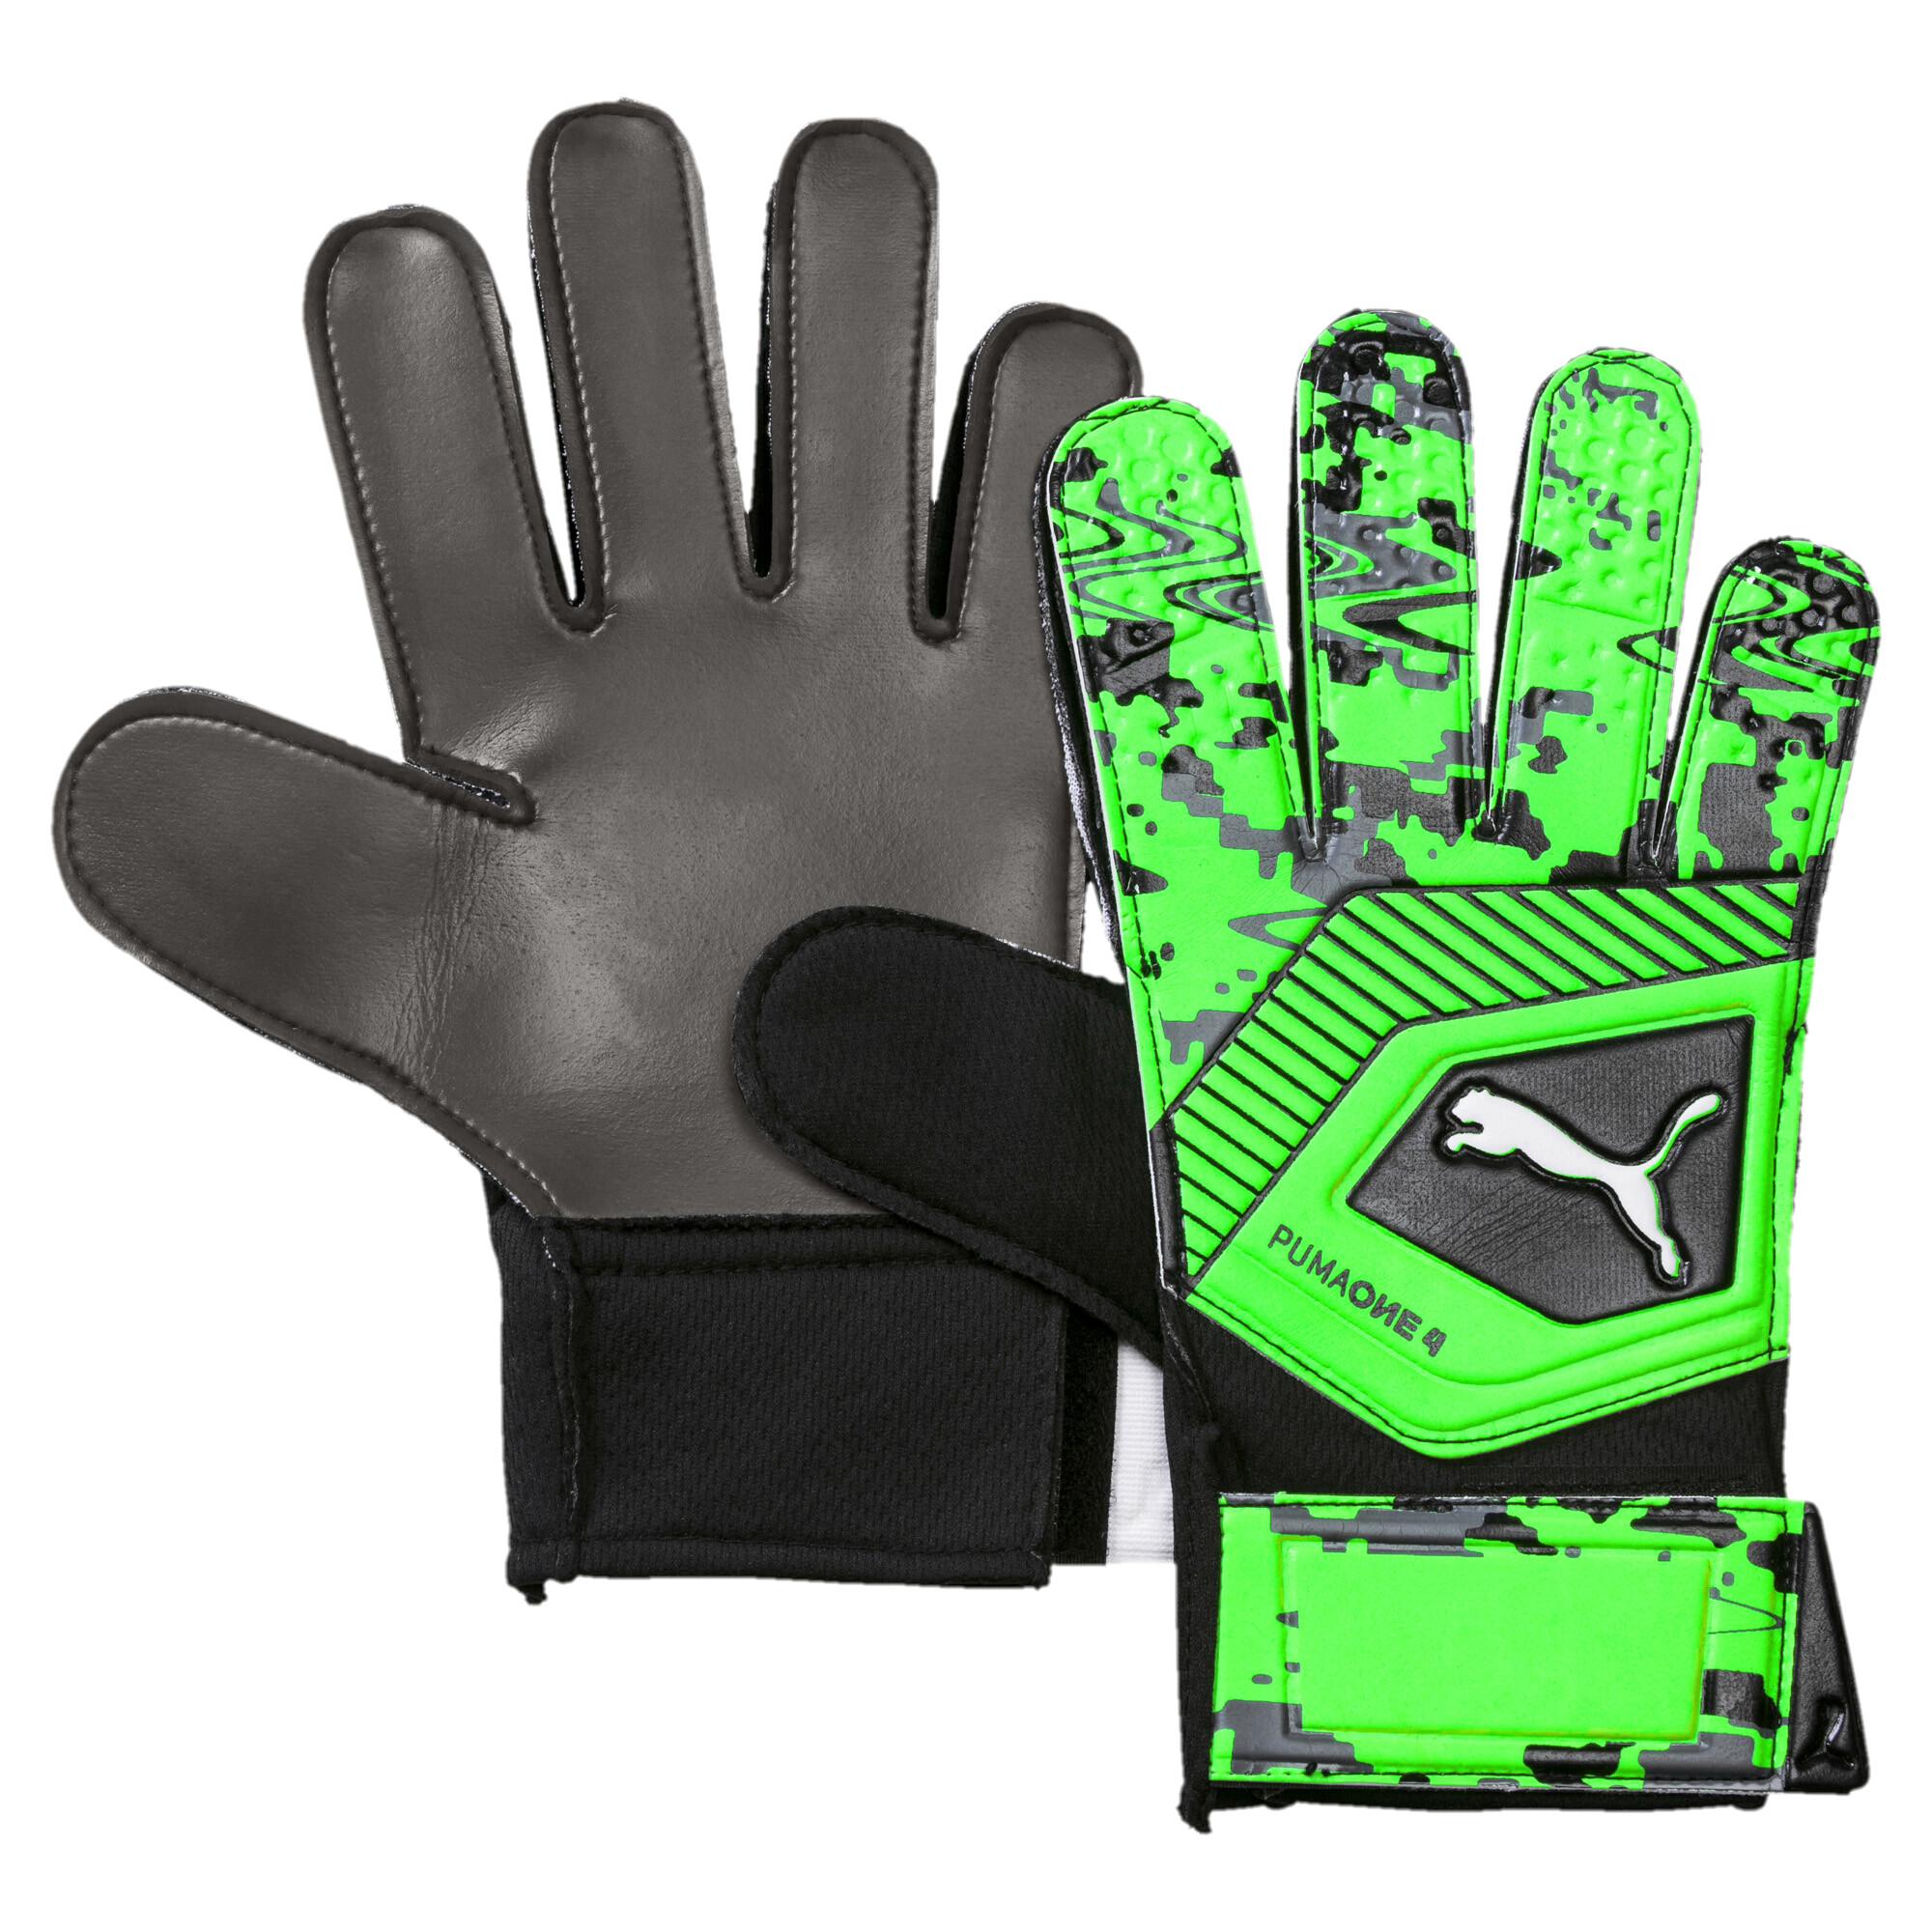 Image Puma PUMA ONE Grip 4 Football Goalie's Gloves #1